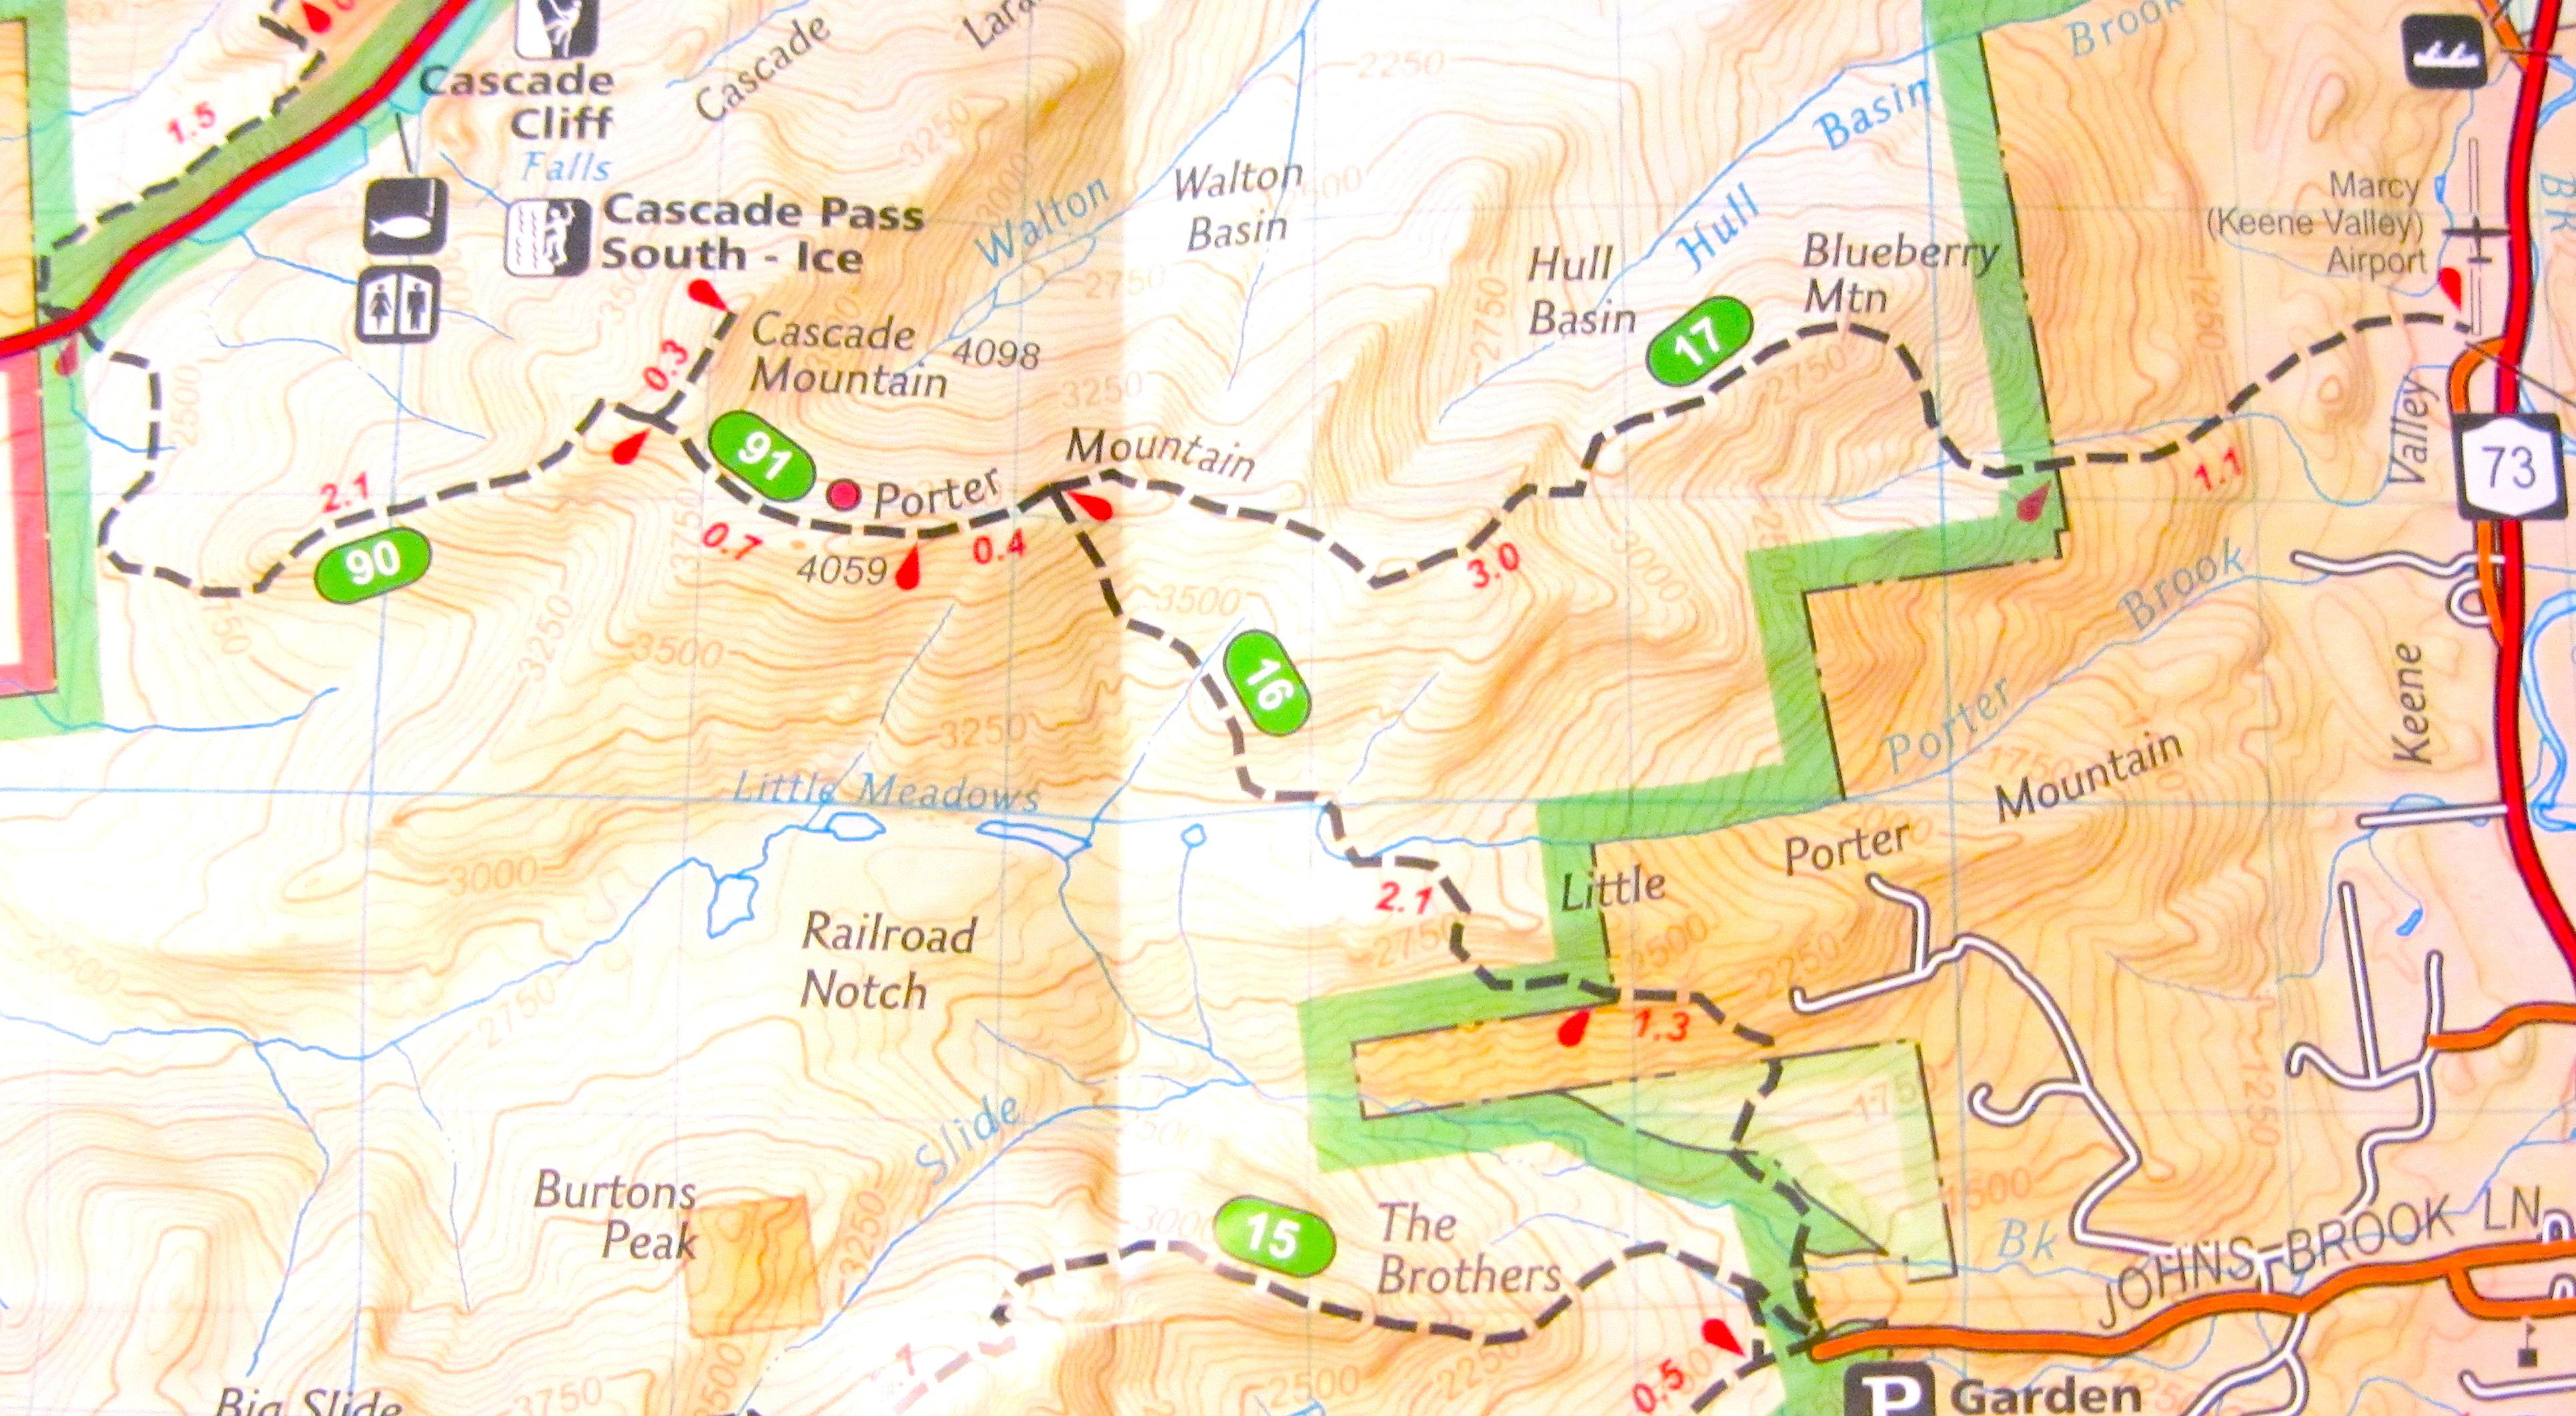 Cascade Mountain Finding North - Cascade mountains on us map